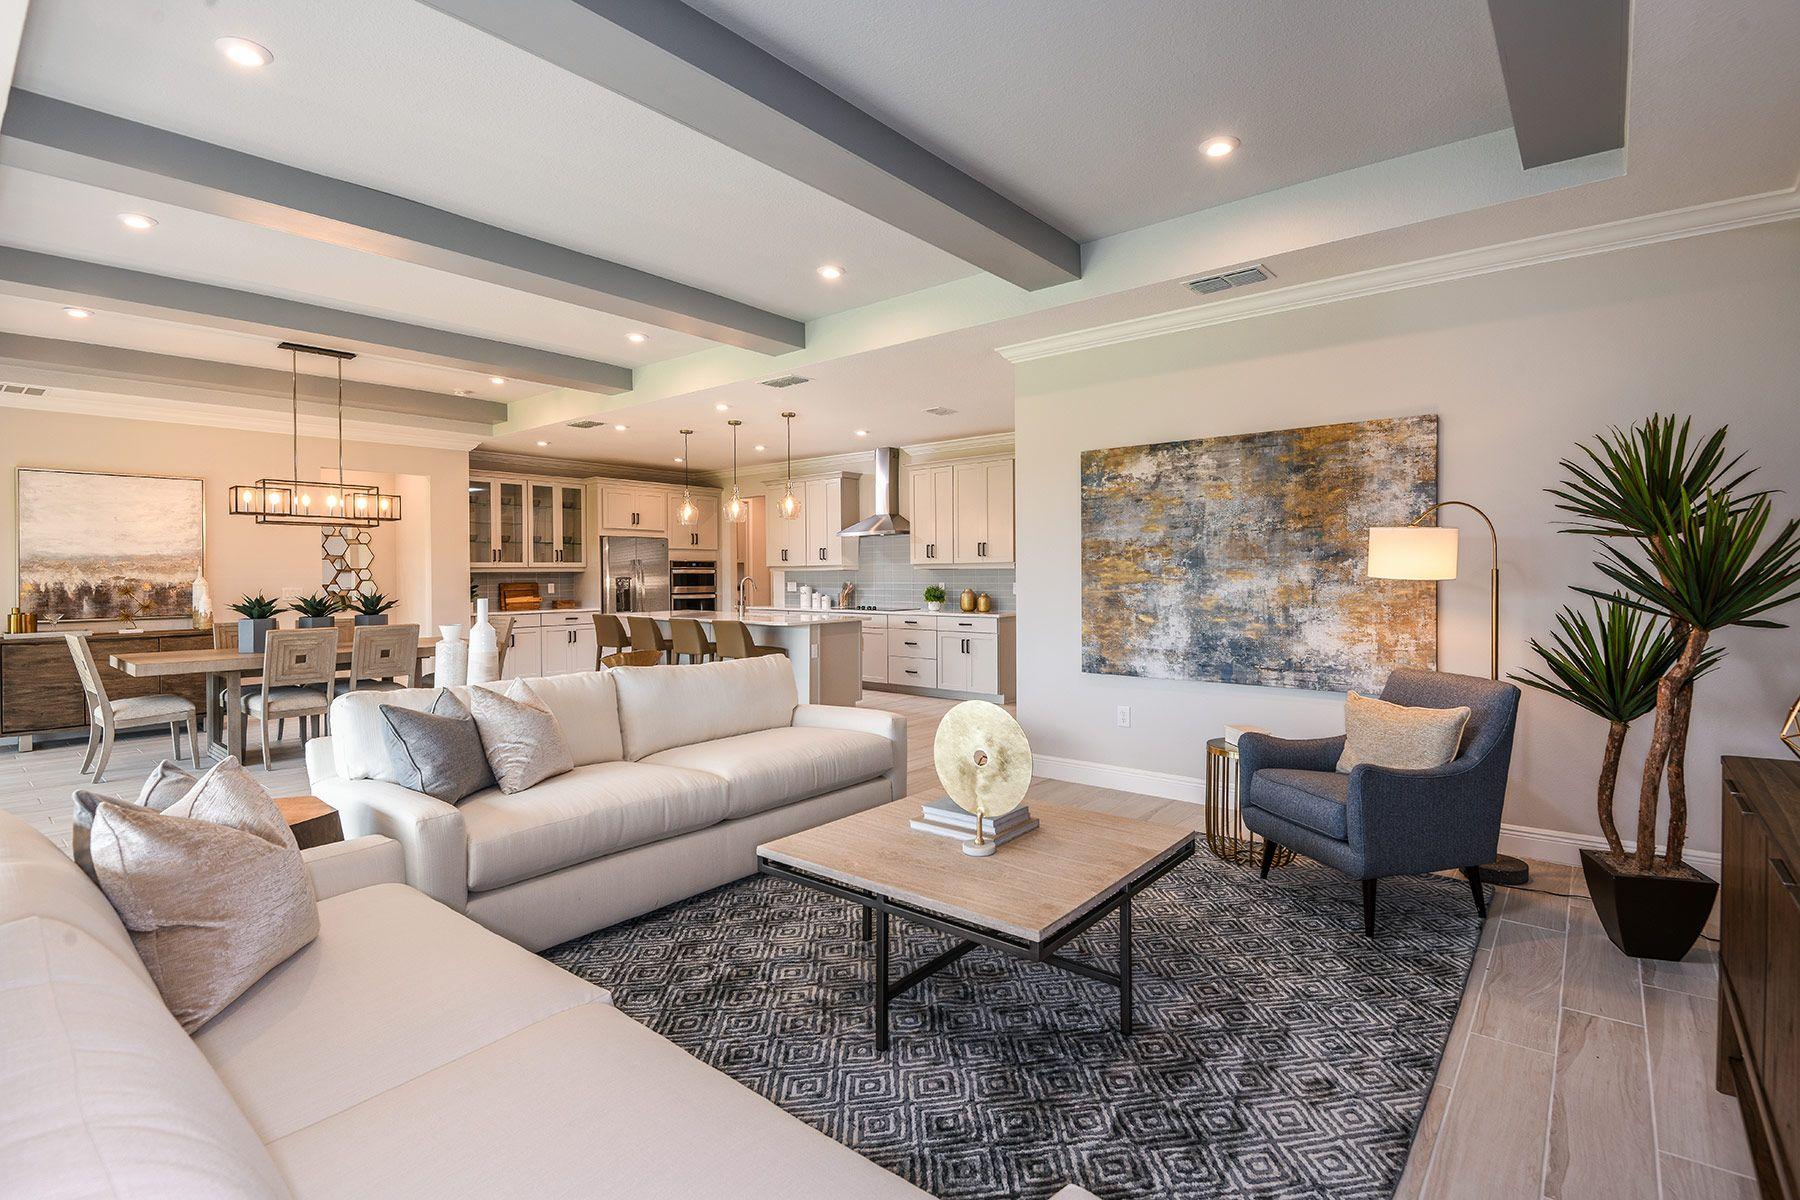 'Wellen Park - Renaissance' by Mattamy Homes - Sarasota-Bradenton in Sarasota-Bradenton